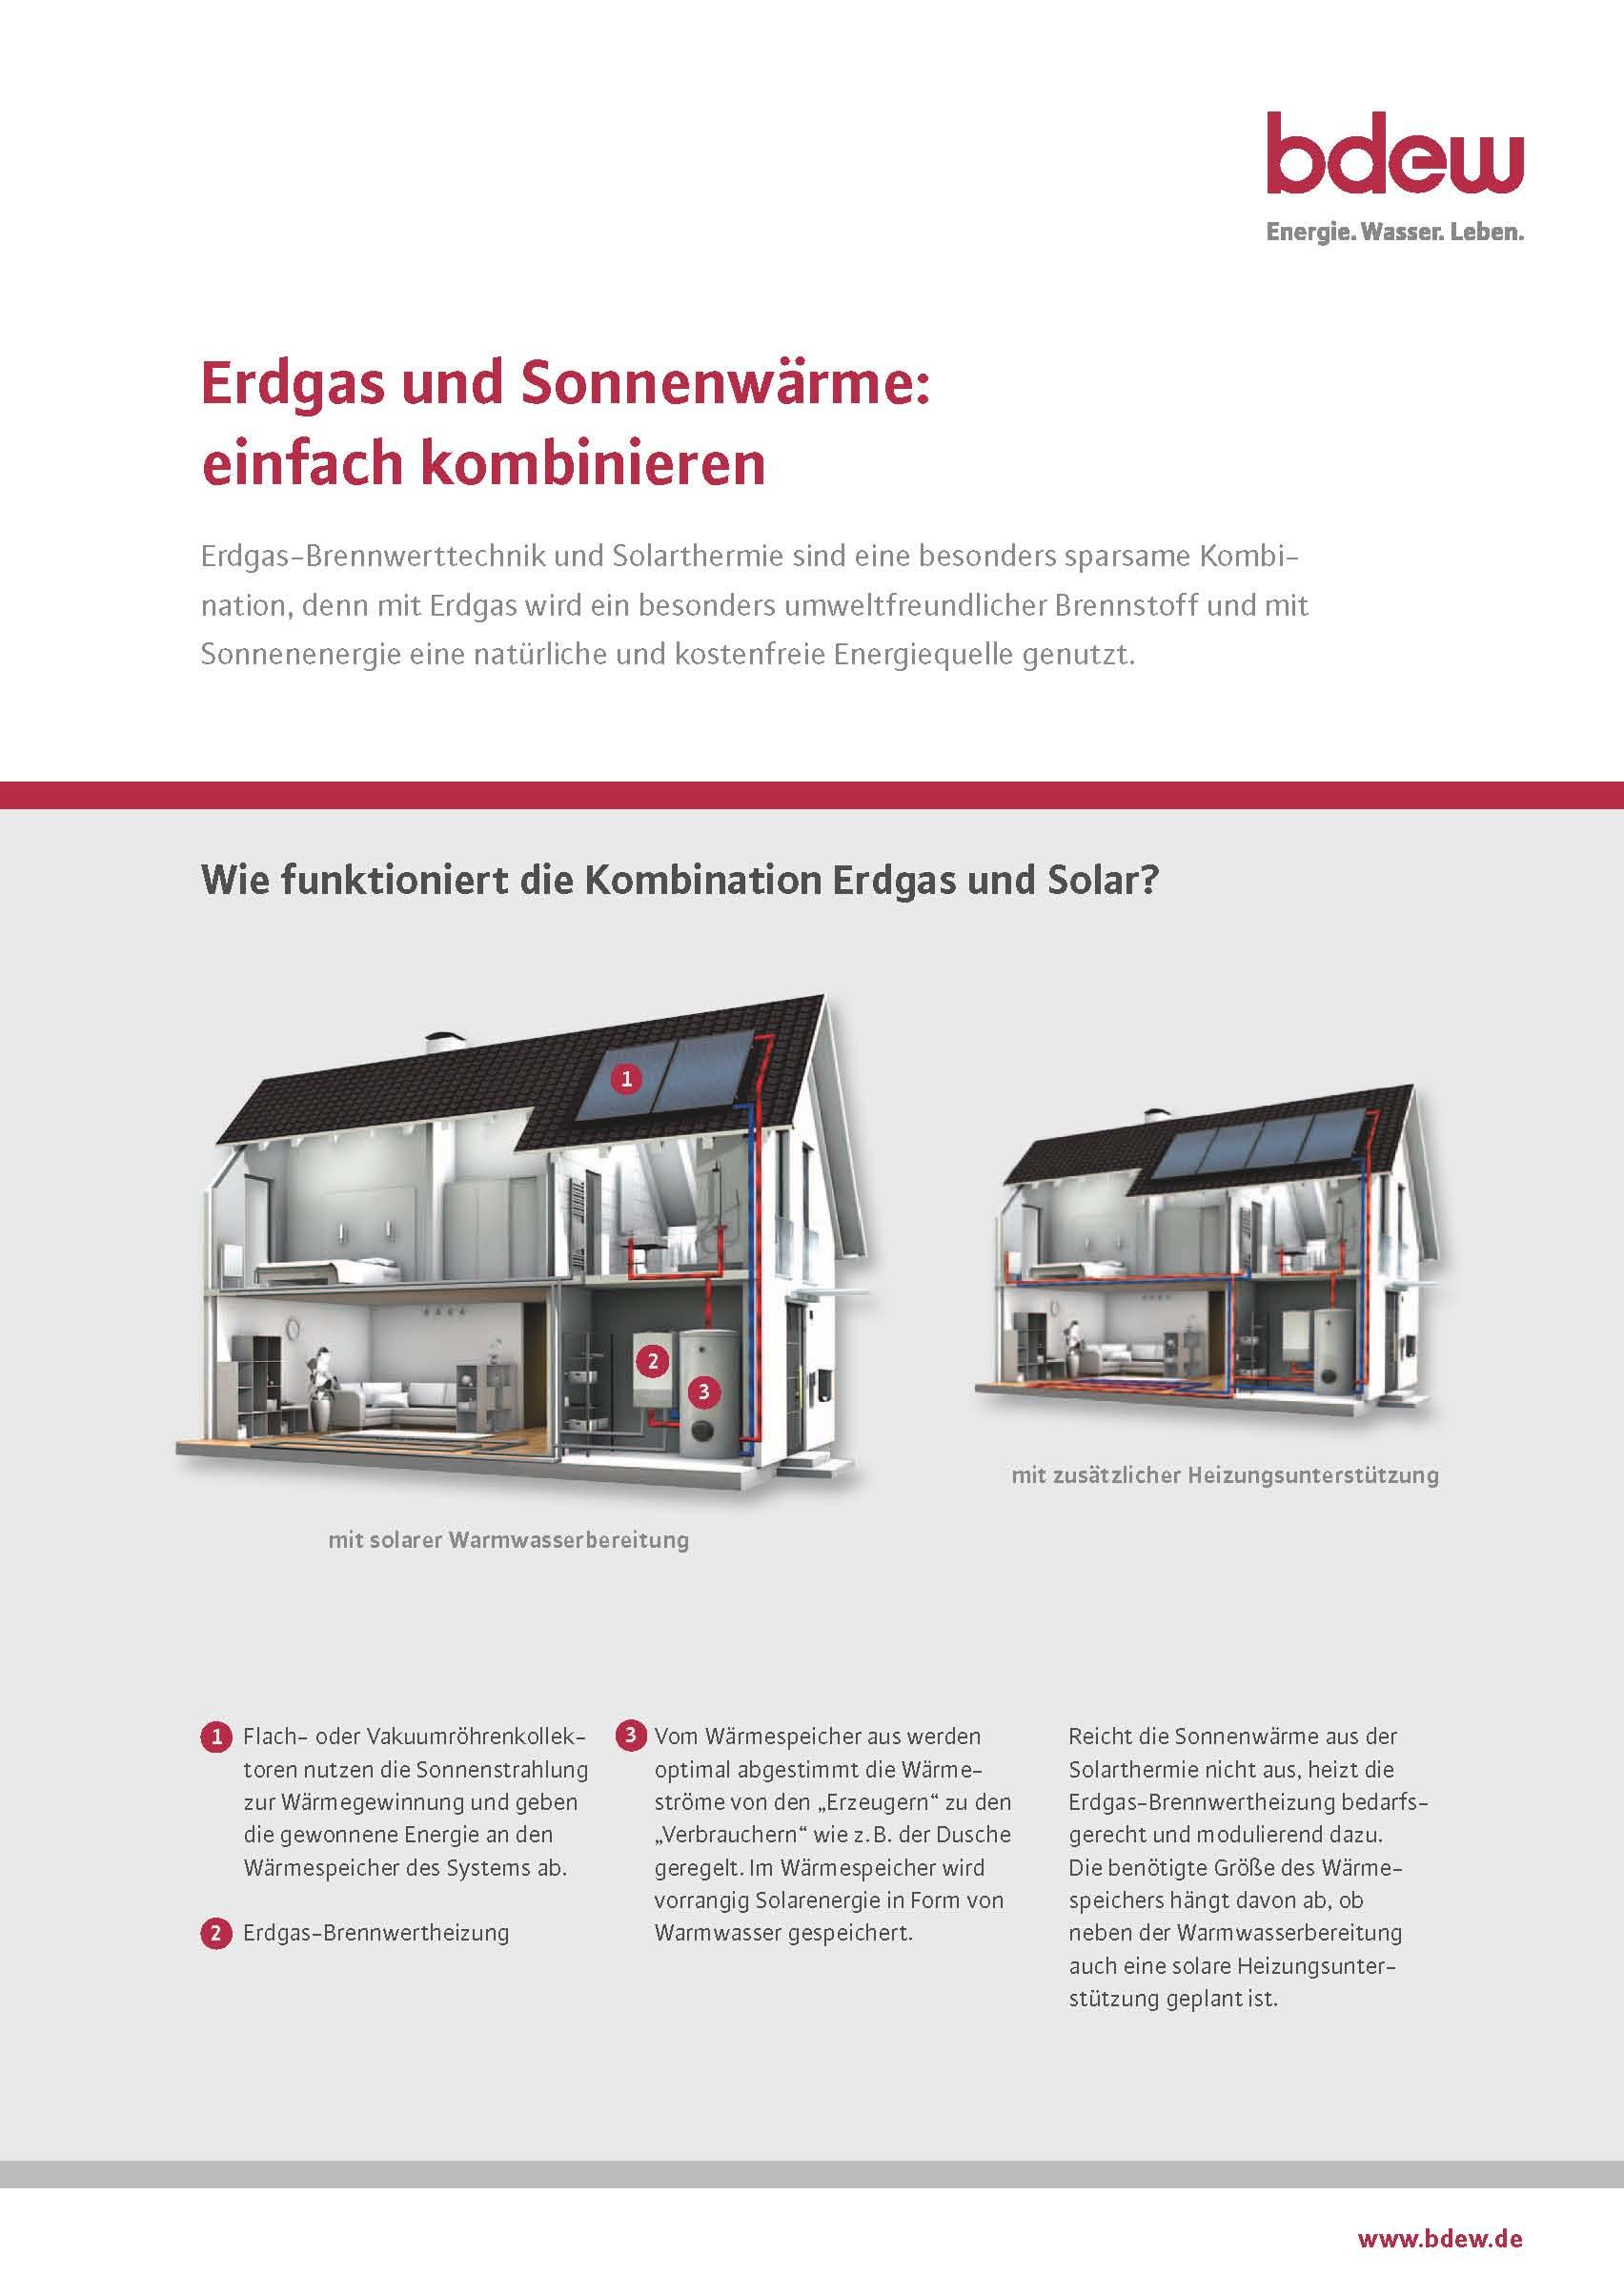 moderne erdgas technologien f r jeden gewerbebedarf. Black Bedroom Furniture Sets. Home Design Ideas